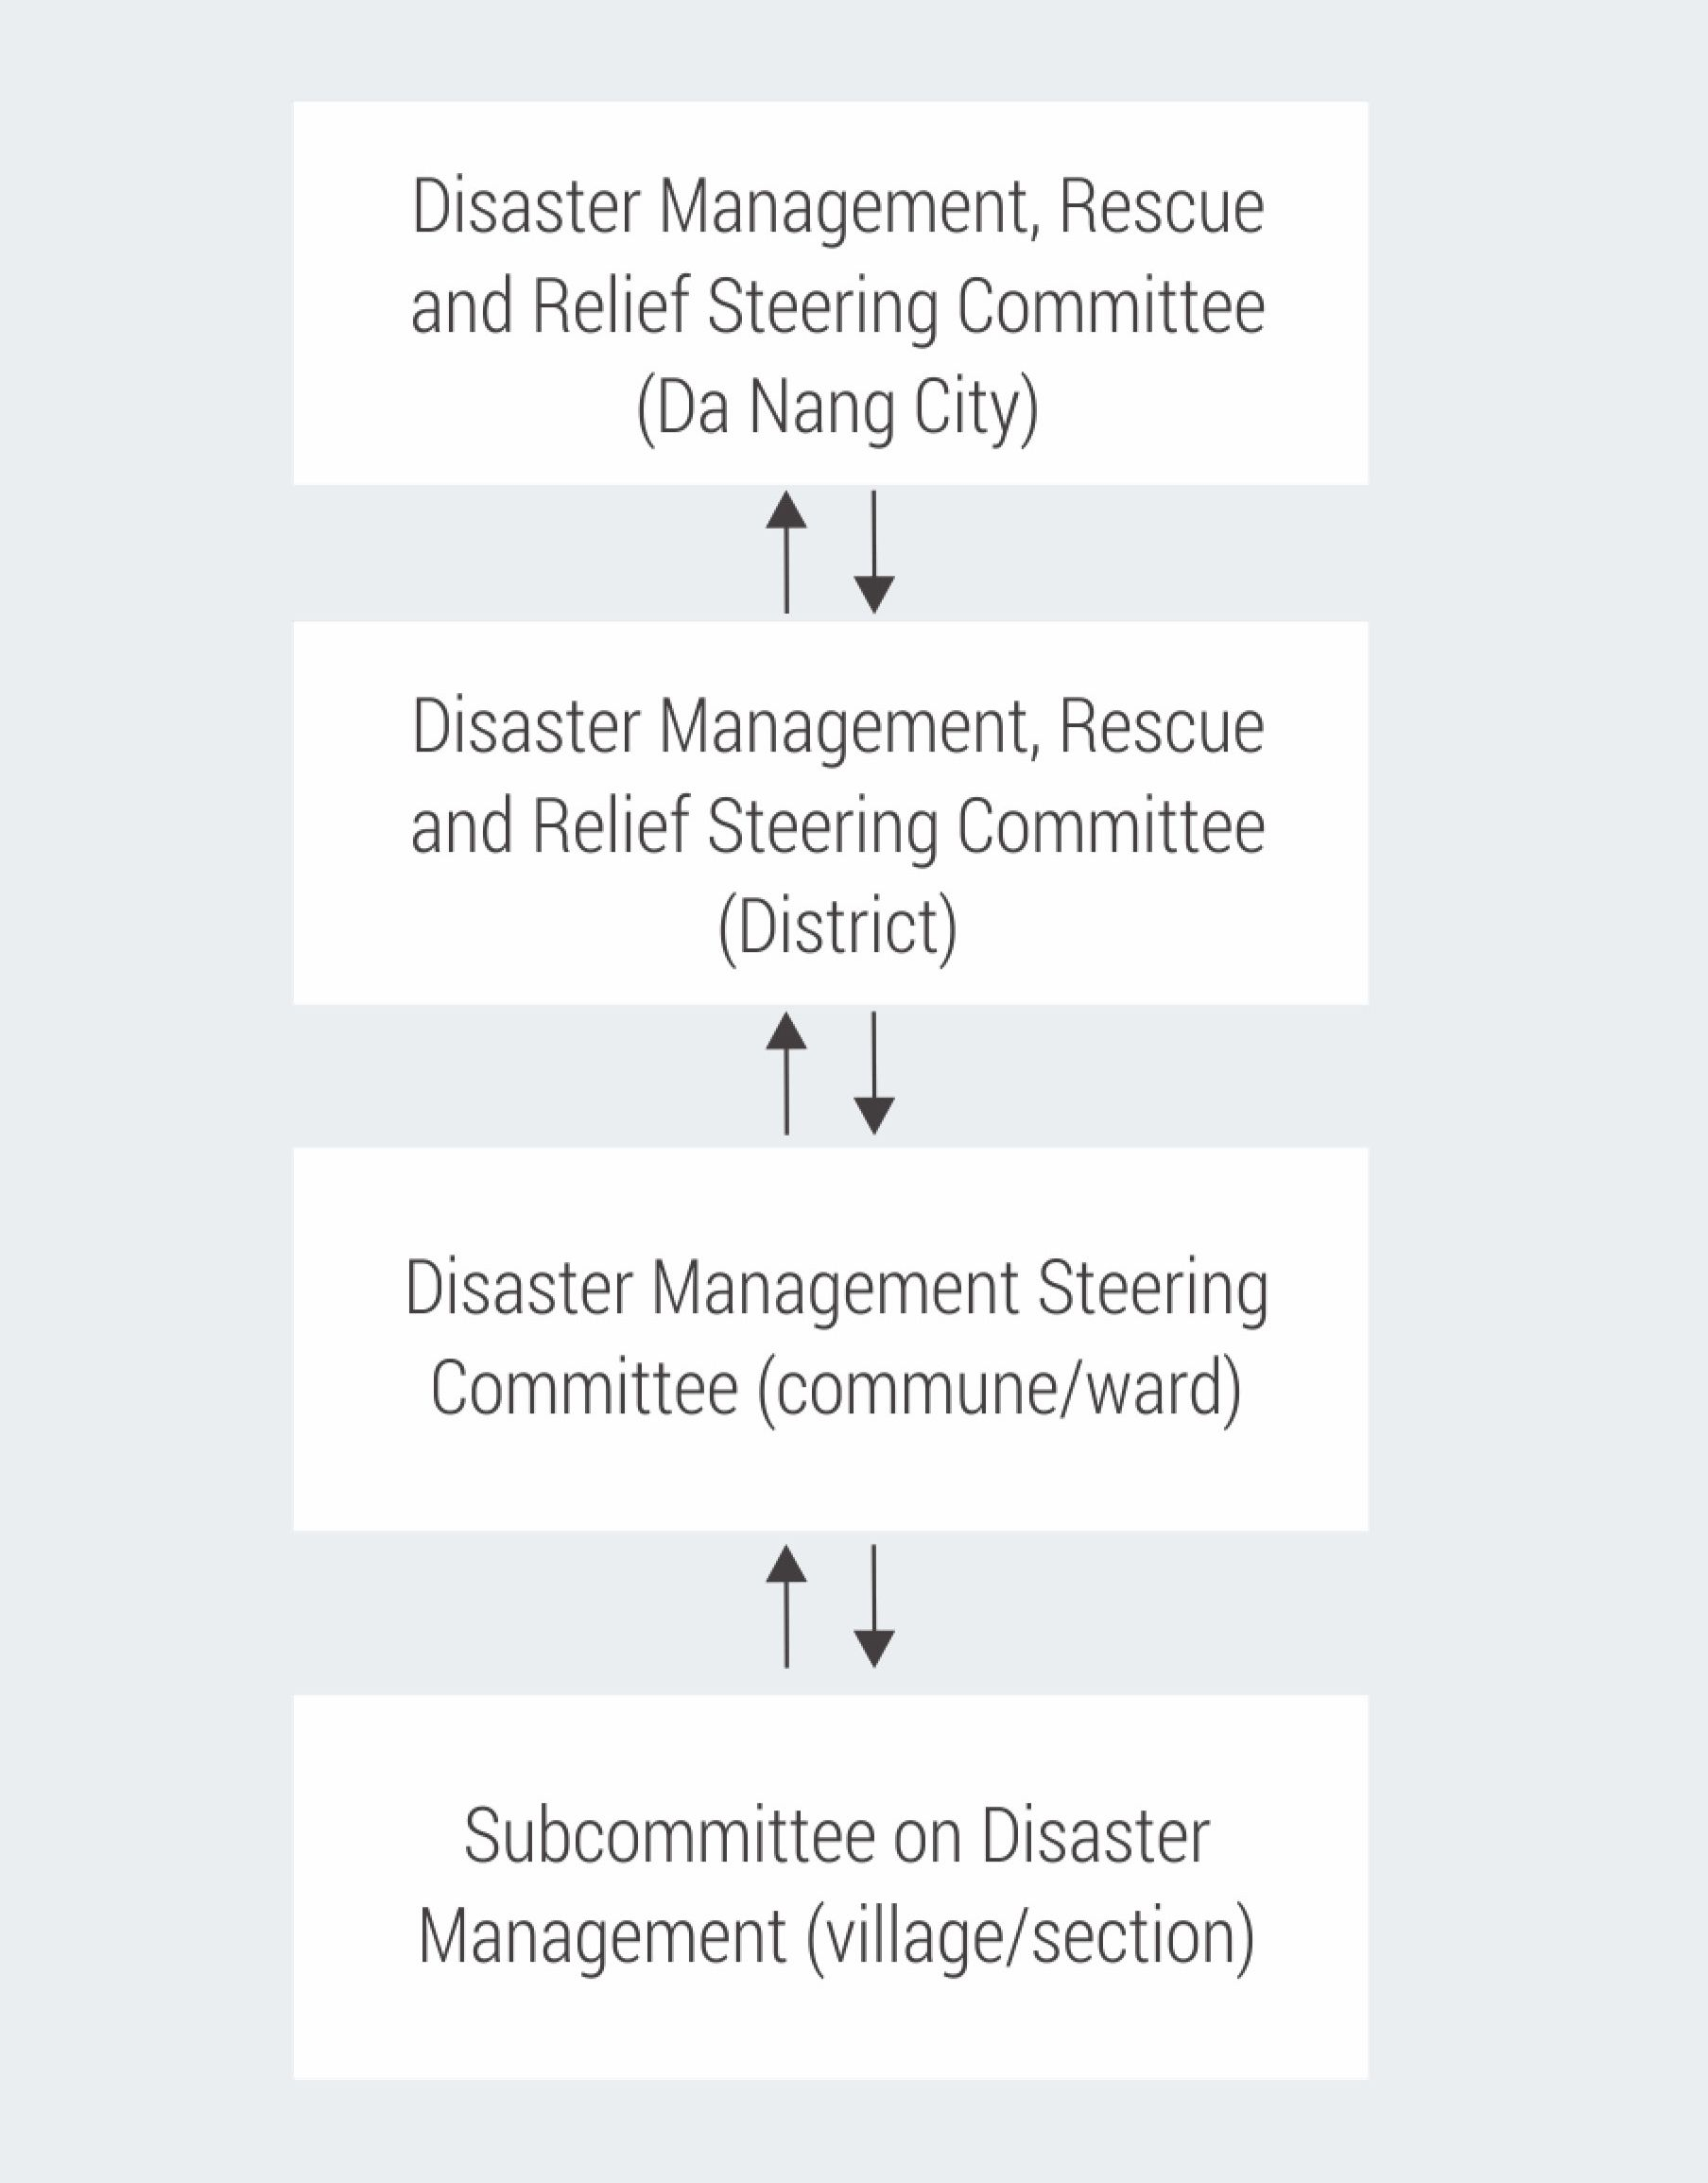 Da Nang disaster management committees